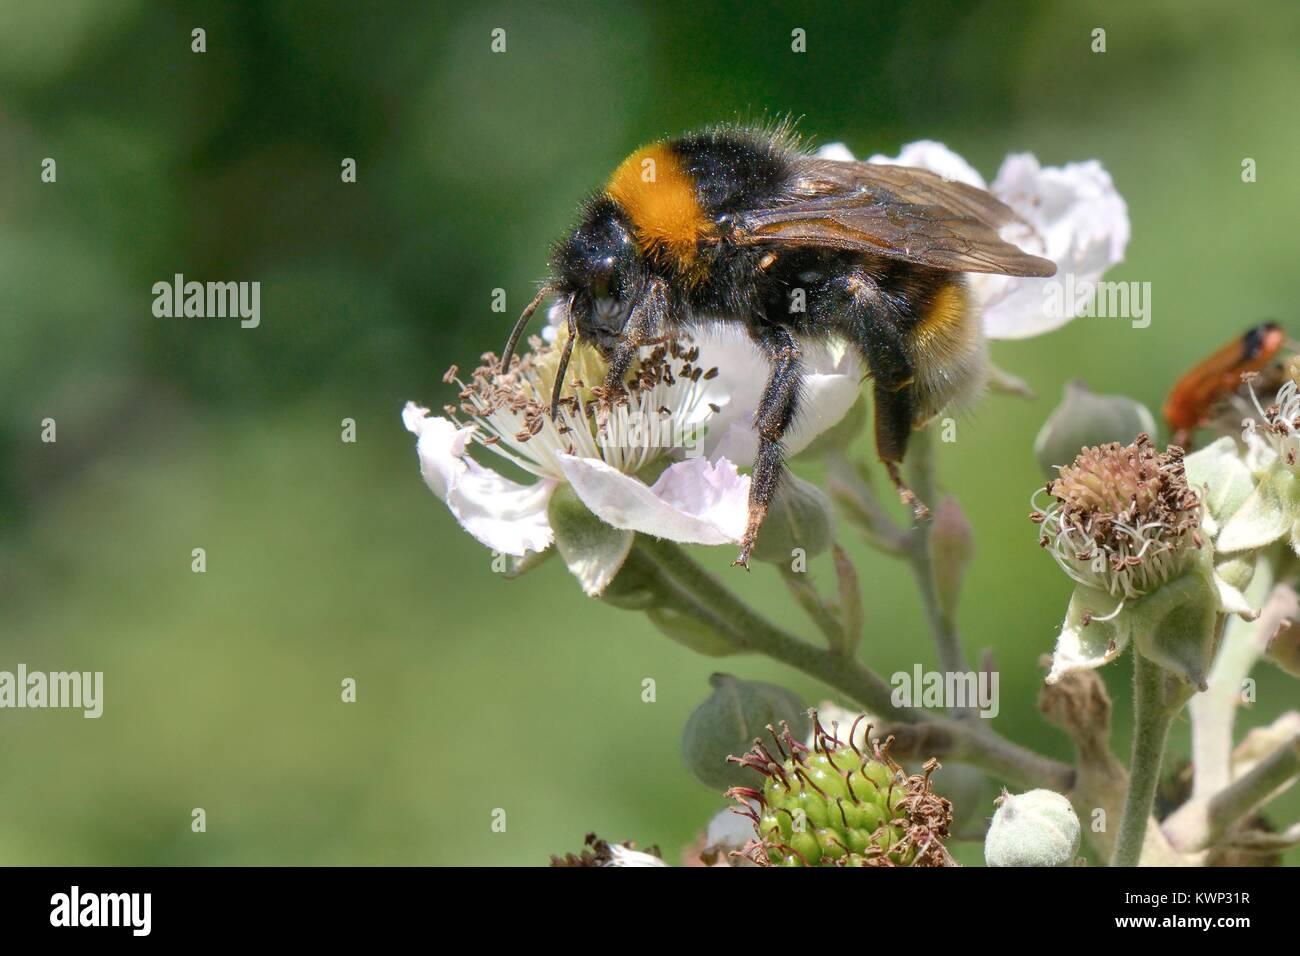 Vestal cuckoo bumblebee (Bumbus vestalis = Psithyrus vestalis) a brood parasite and mimic of Buff-tailed bumblebees, - Stock Image